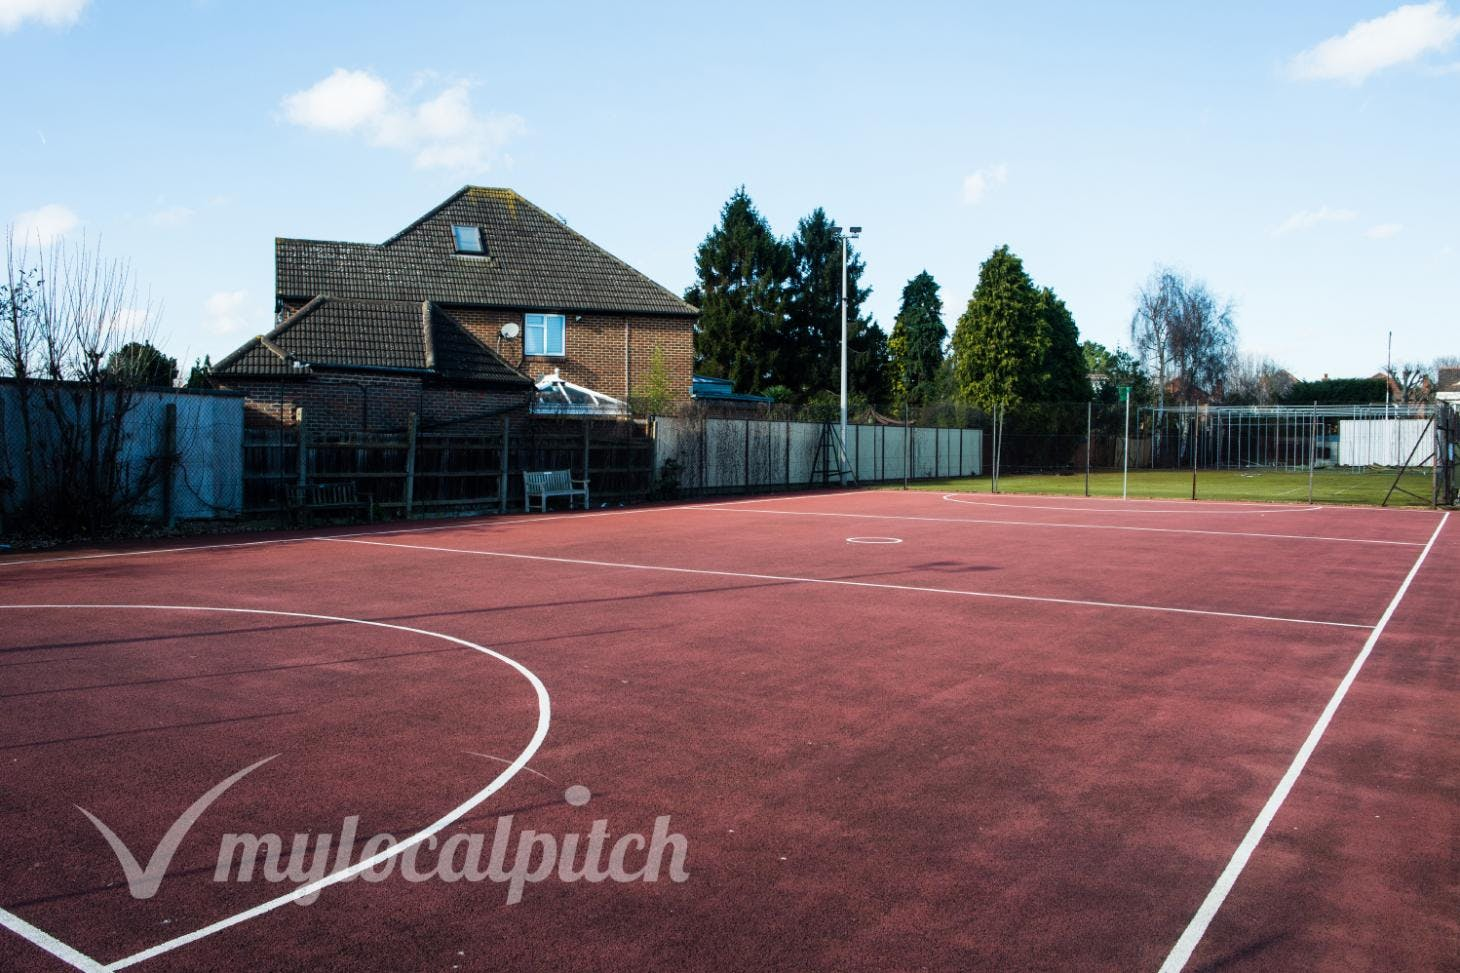 Old Actonians Association Outdoor   Hard (macadam) netball court